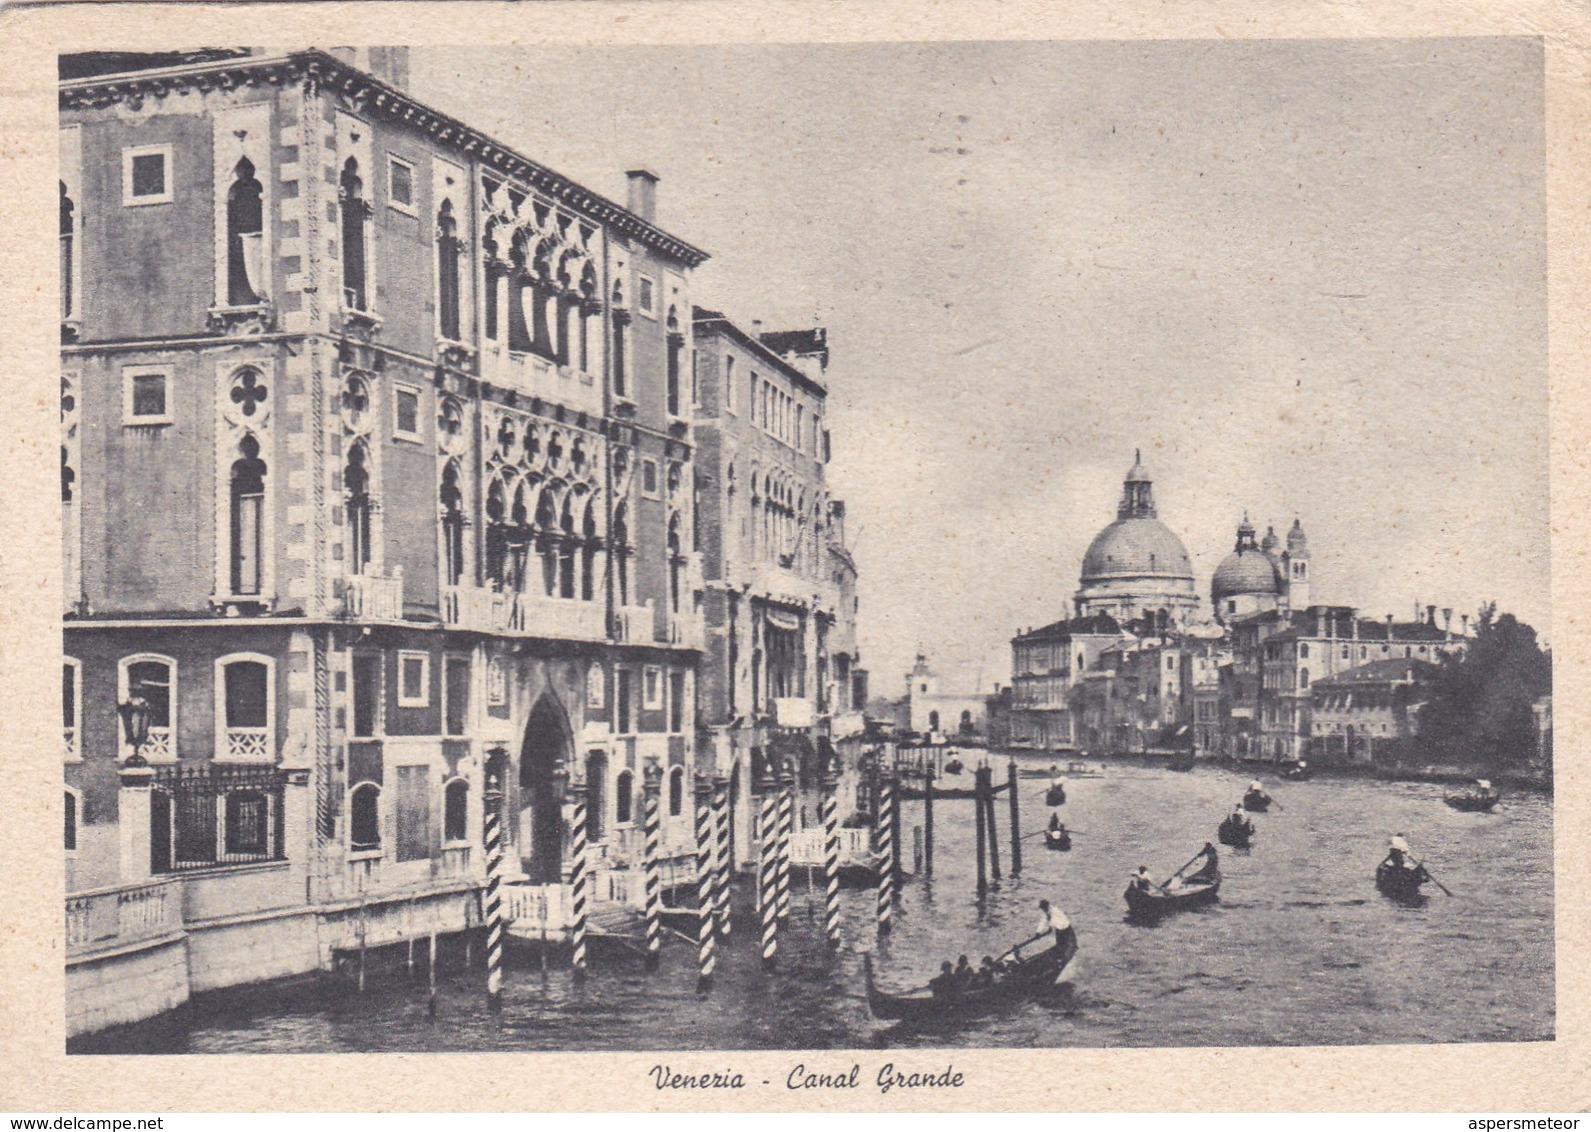 VENEZIA. CANAL GRANDE. CIRCULEE 1949 A BUENOS AIRES - BLEUP - Venezia (Venice)